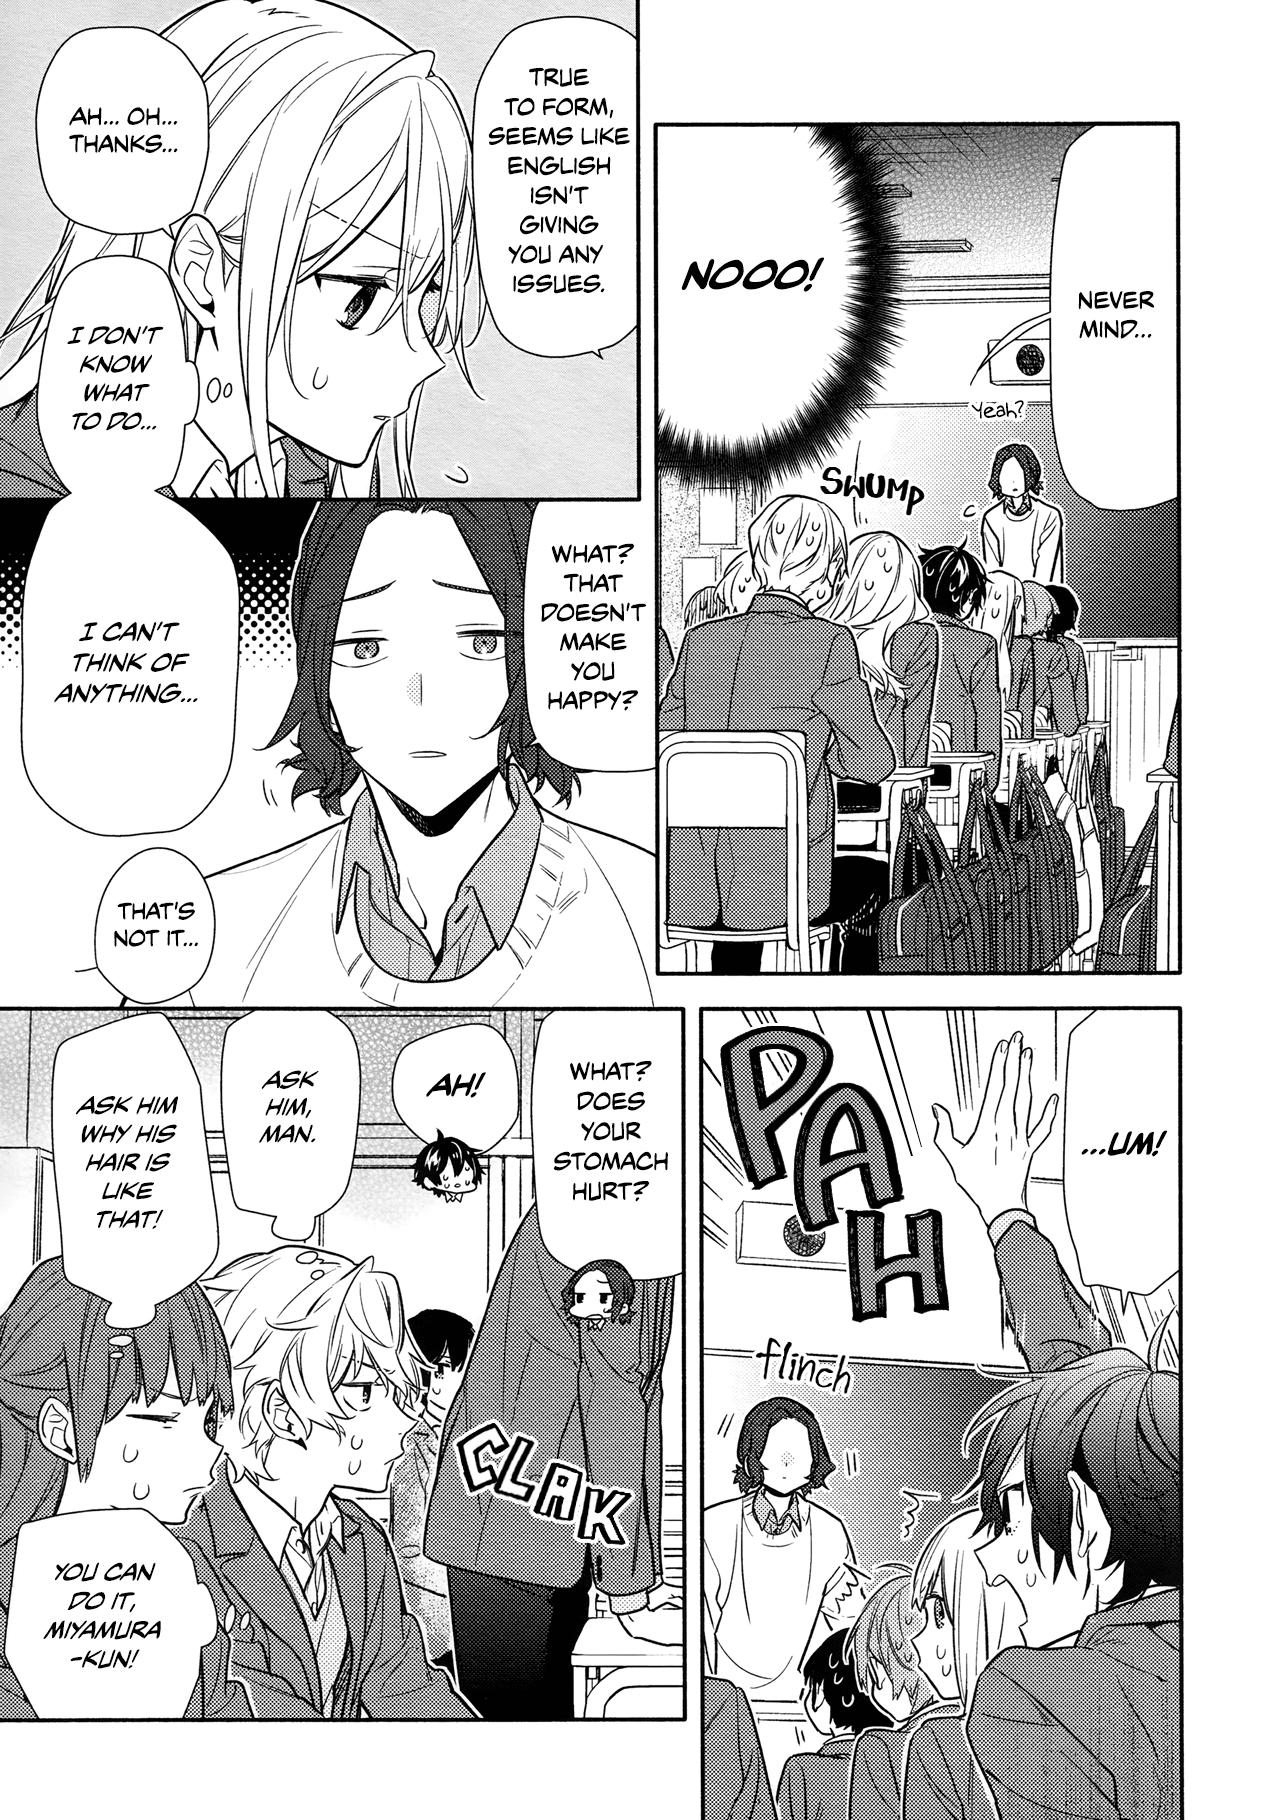 Horimiya, Chapter 112 Page 11